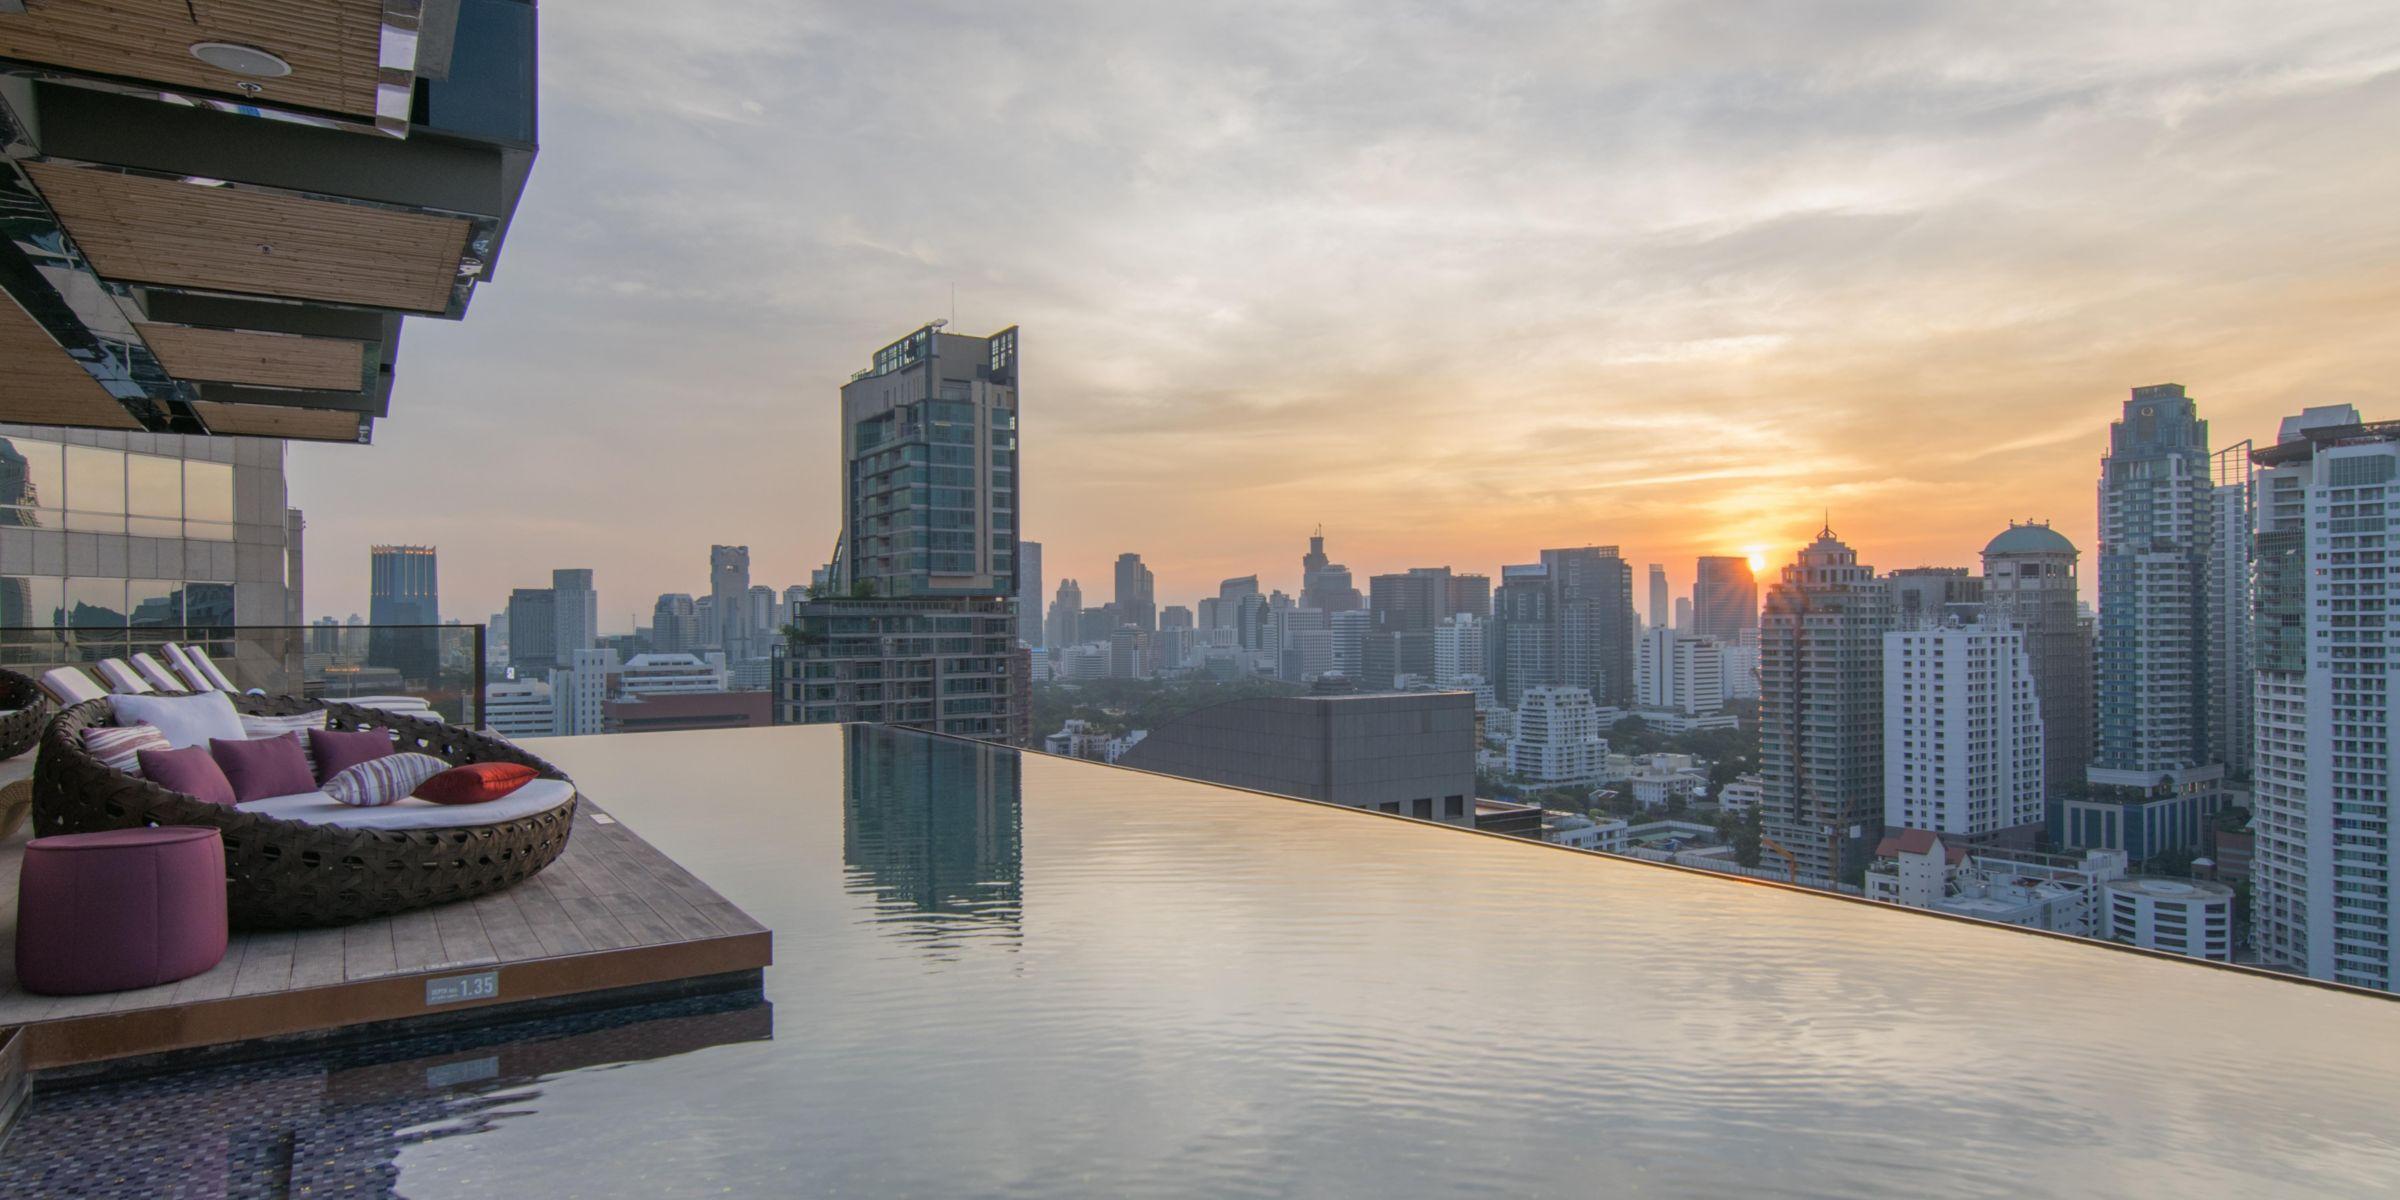 Bangkok Hotels Hotel Indigo Bangkok Wireless Road Hotel In - Video 90 seconds in bangkok